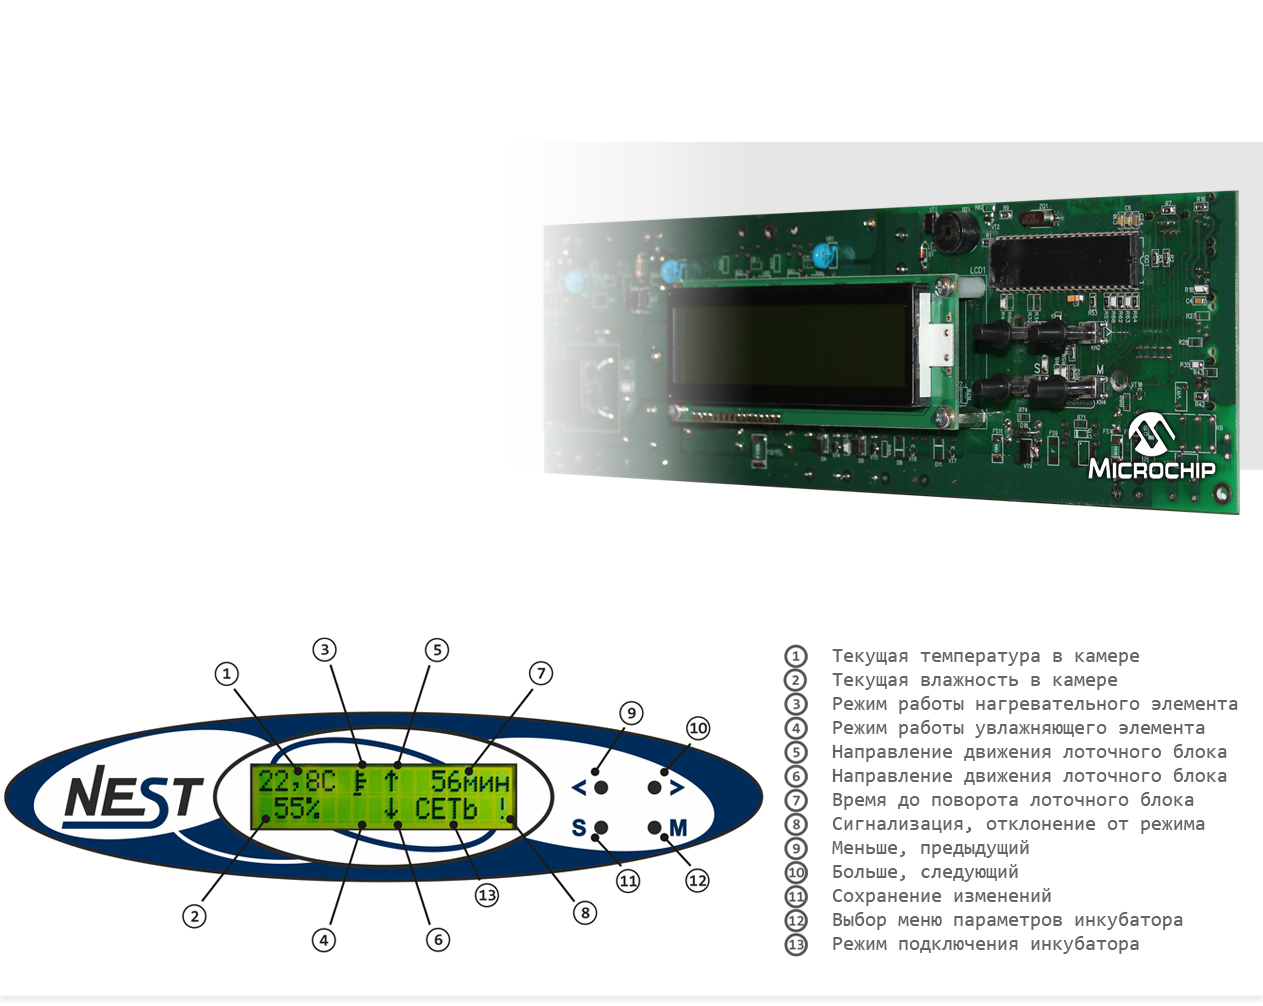 http://купи-инкубатор.рф/images/upload/33-nest-100_2.jpg